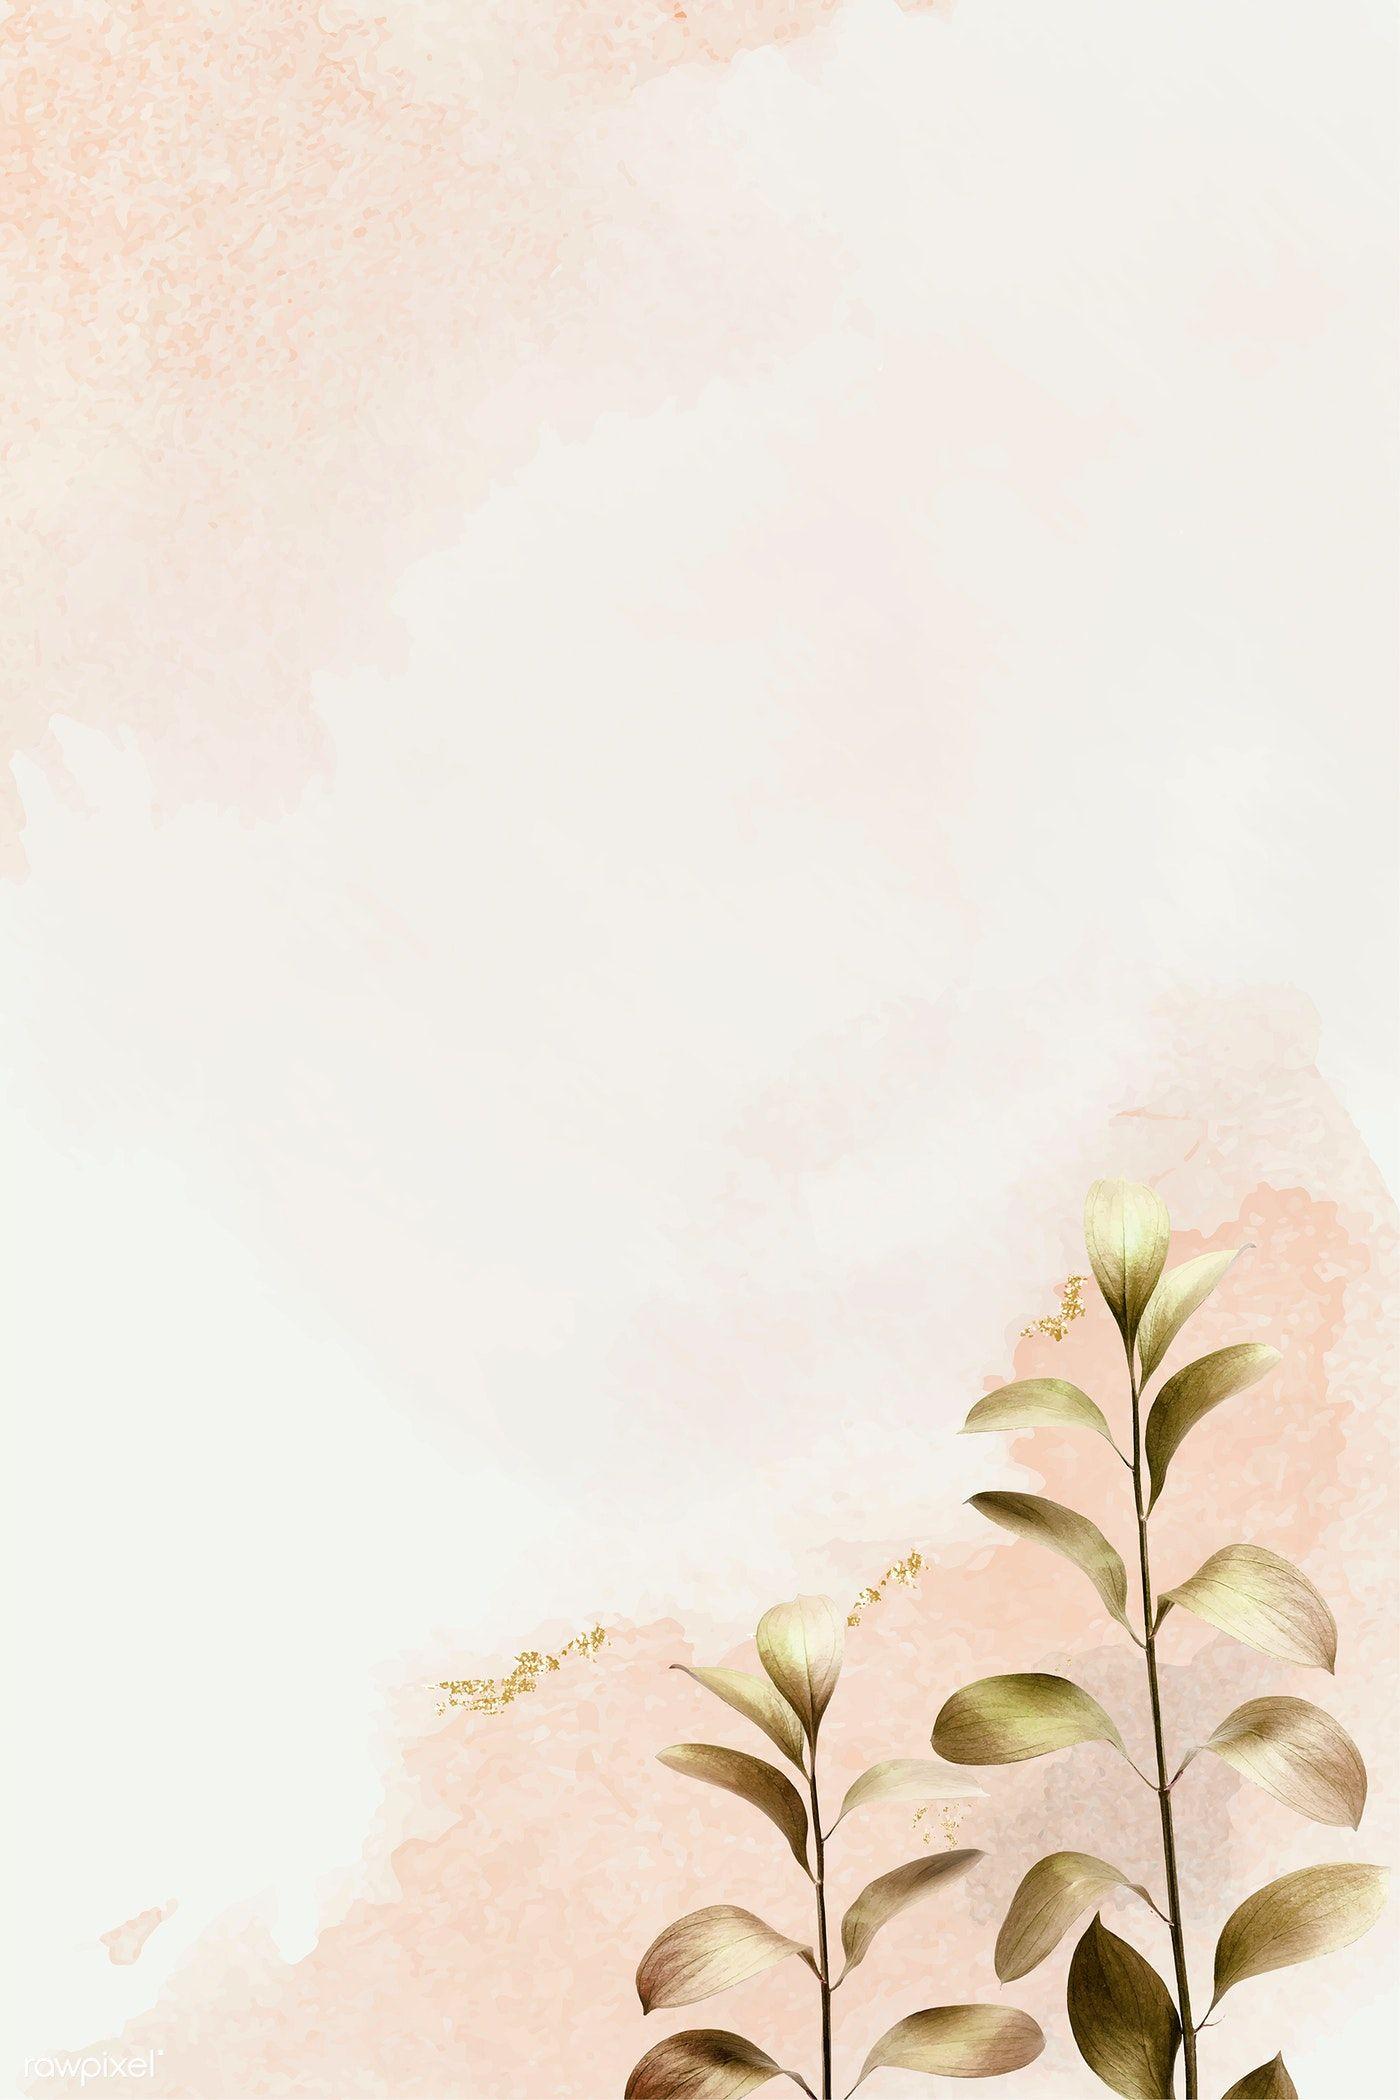 Download premium vector of Eucalyptus pattern background template vector